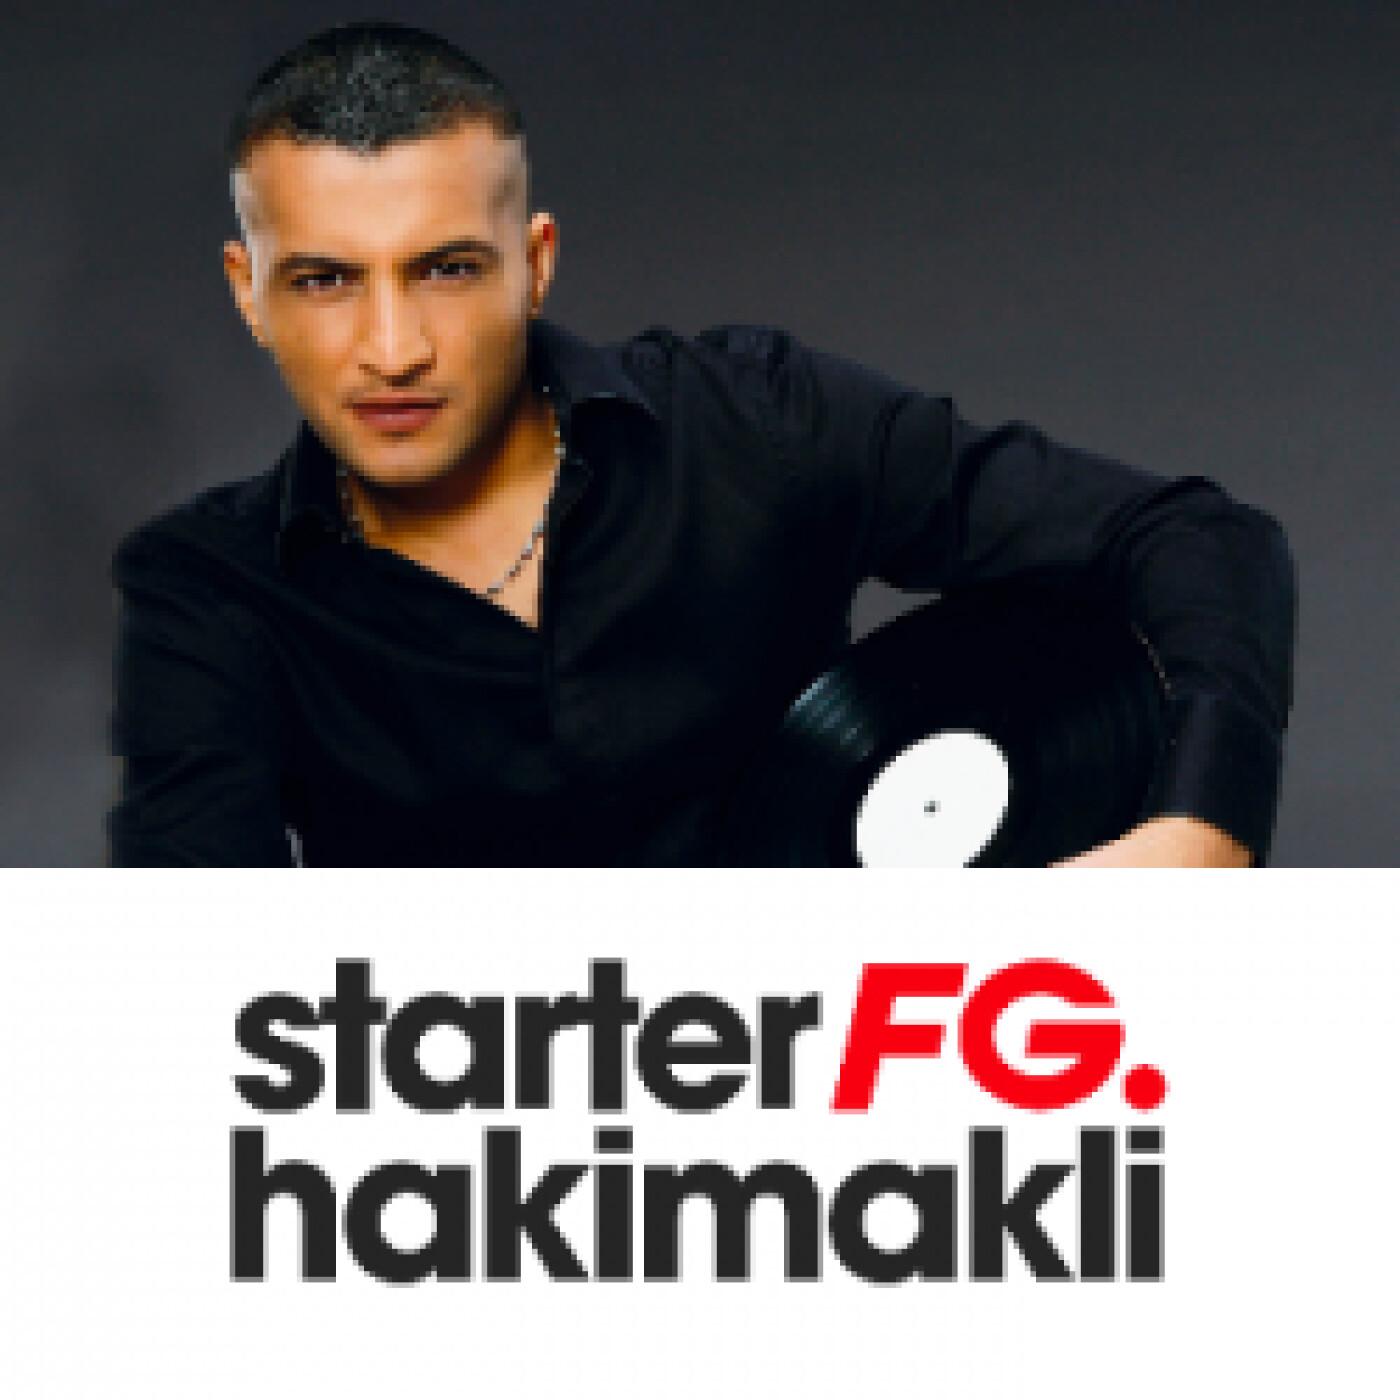 STARTER FG BY HAKIMAKLI MERCREDI 3 FEVRIER 2021